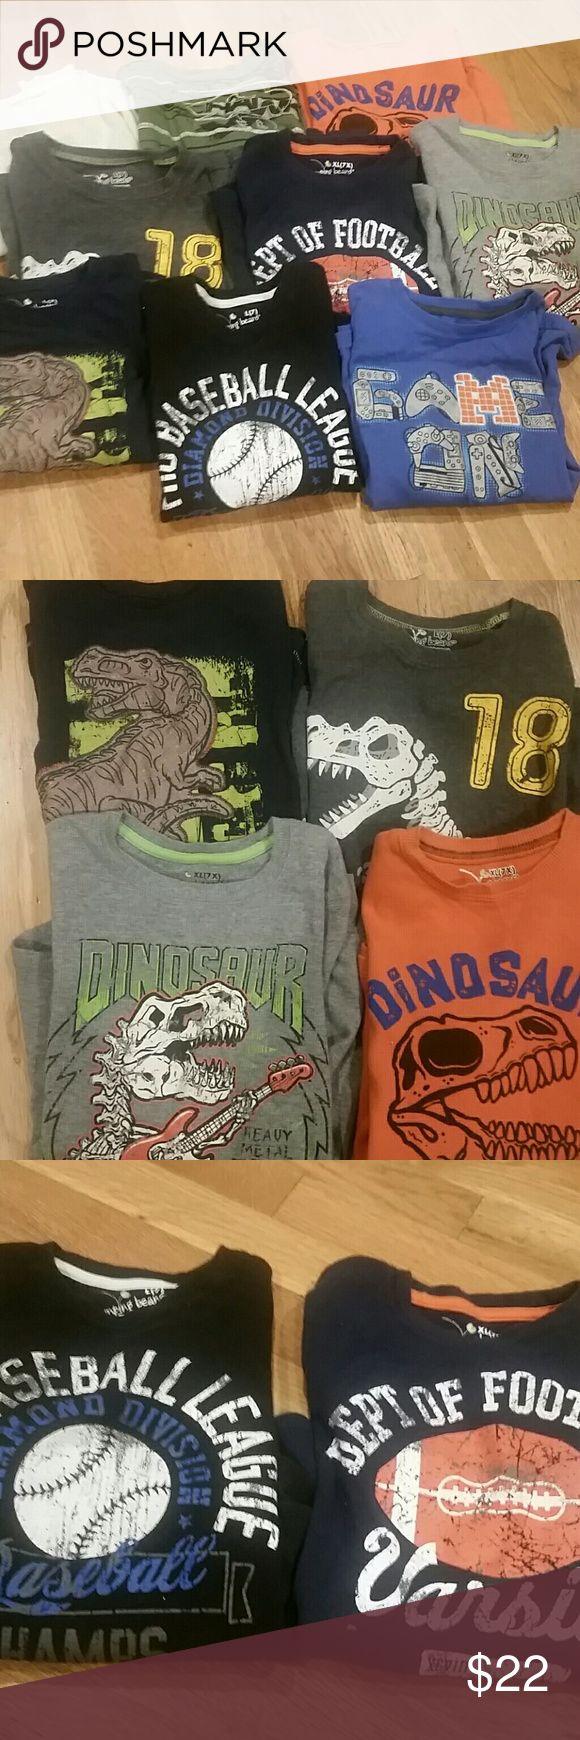 Bundle of 9 Boy's long-sleeved shirts, size 7/7X Four Dinosaur shirts, two sports shirts, one green Tony Hawk shirt, one gaming shirt, and one cream shirt jumping beans Shirts & Tops Tees - Long Sleeve